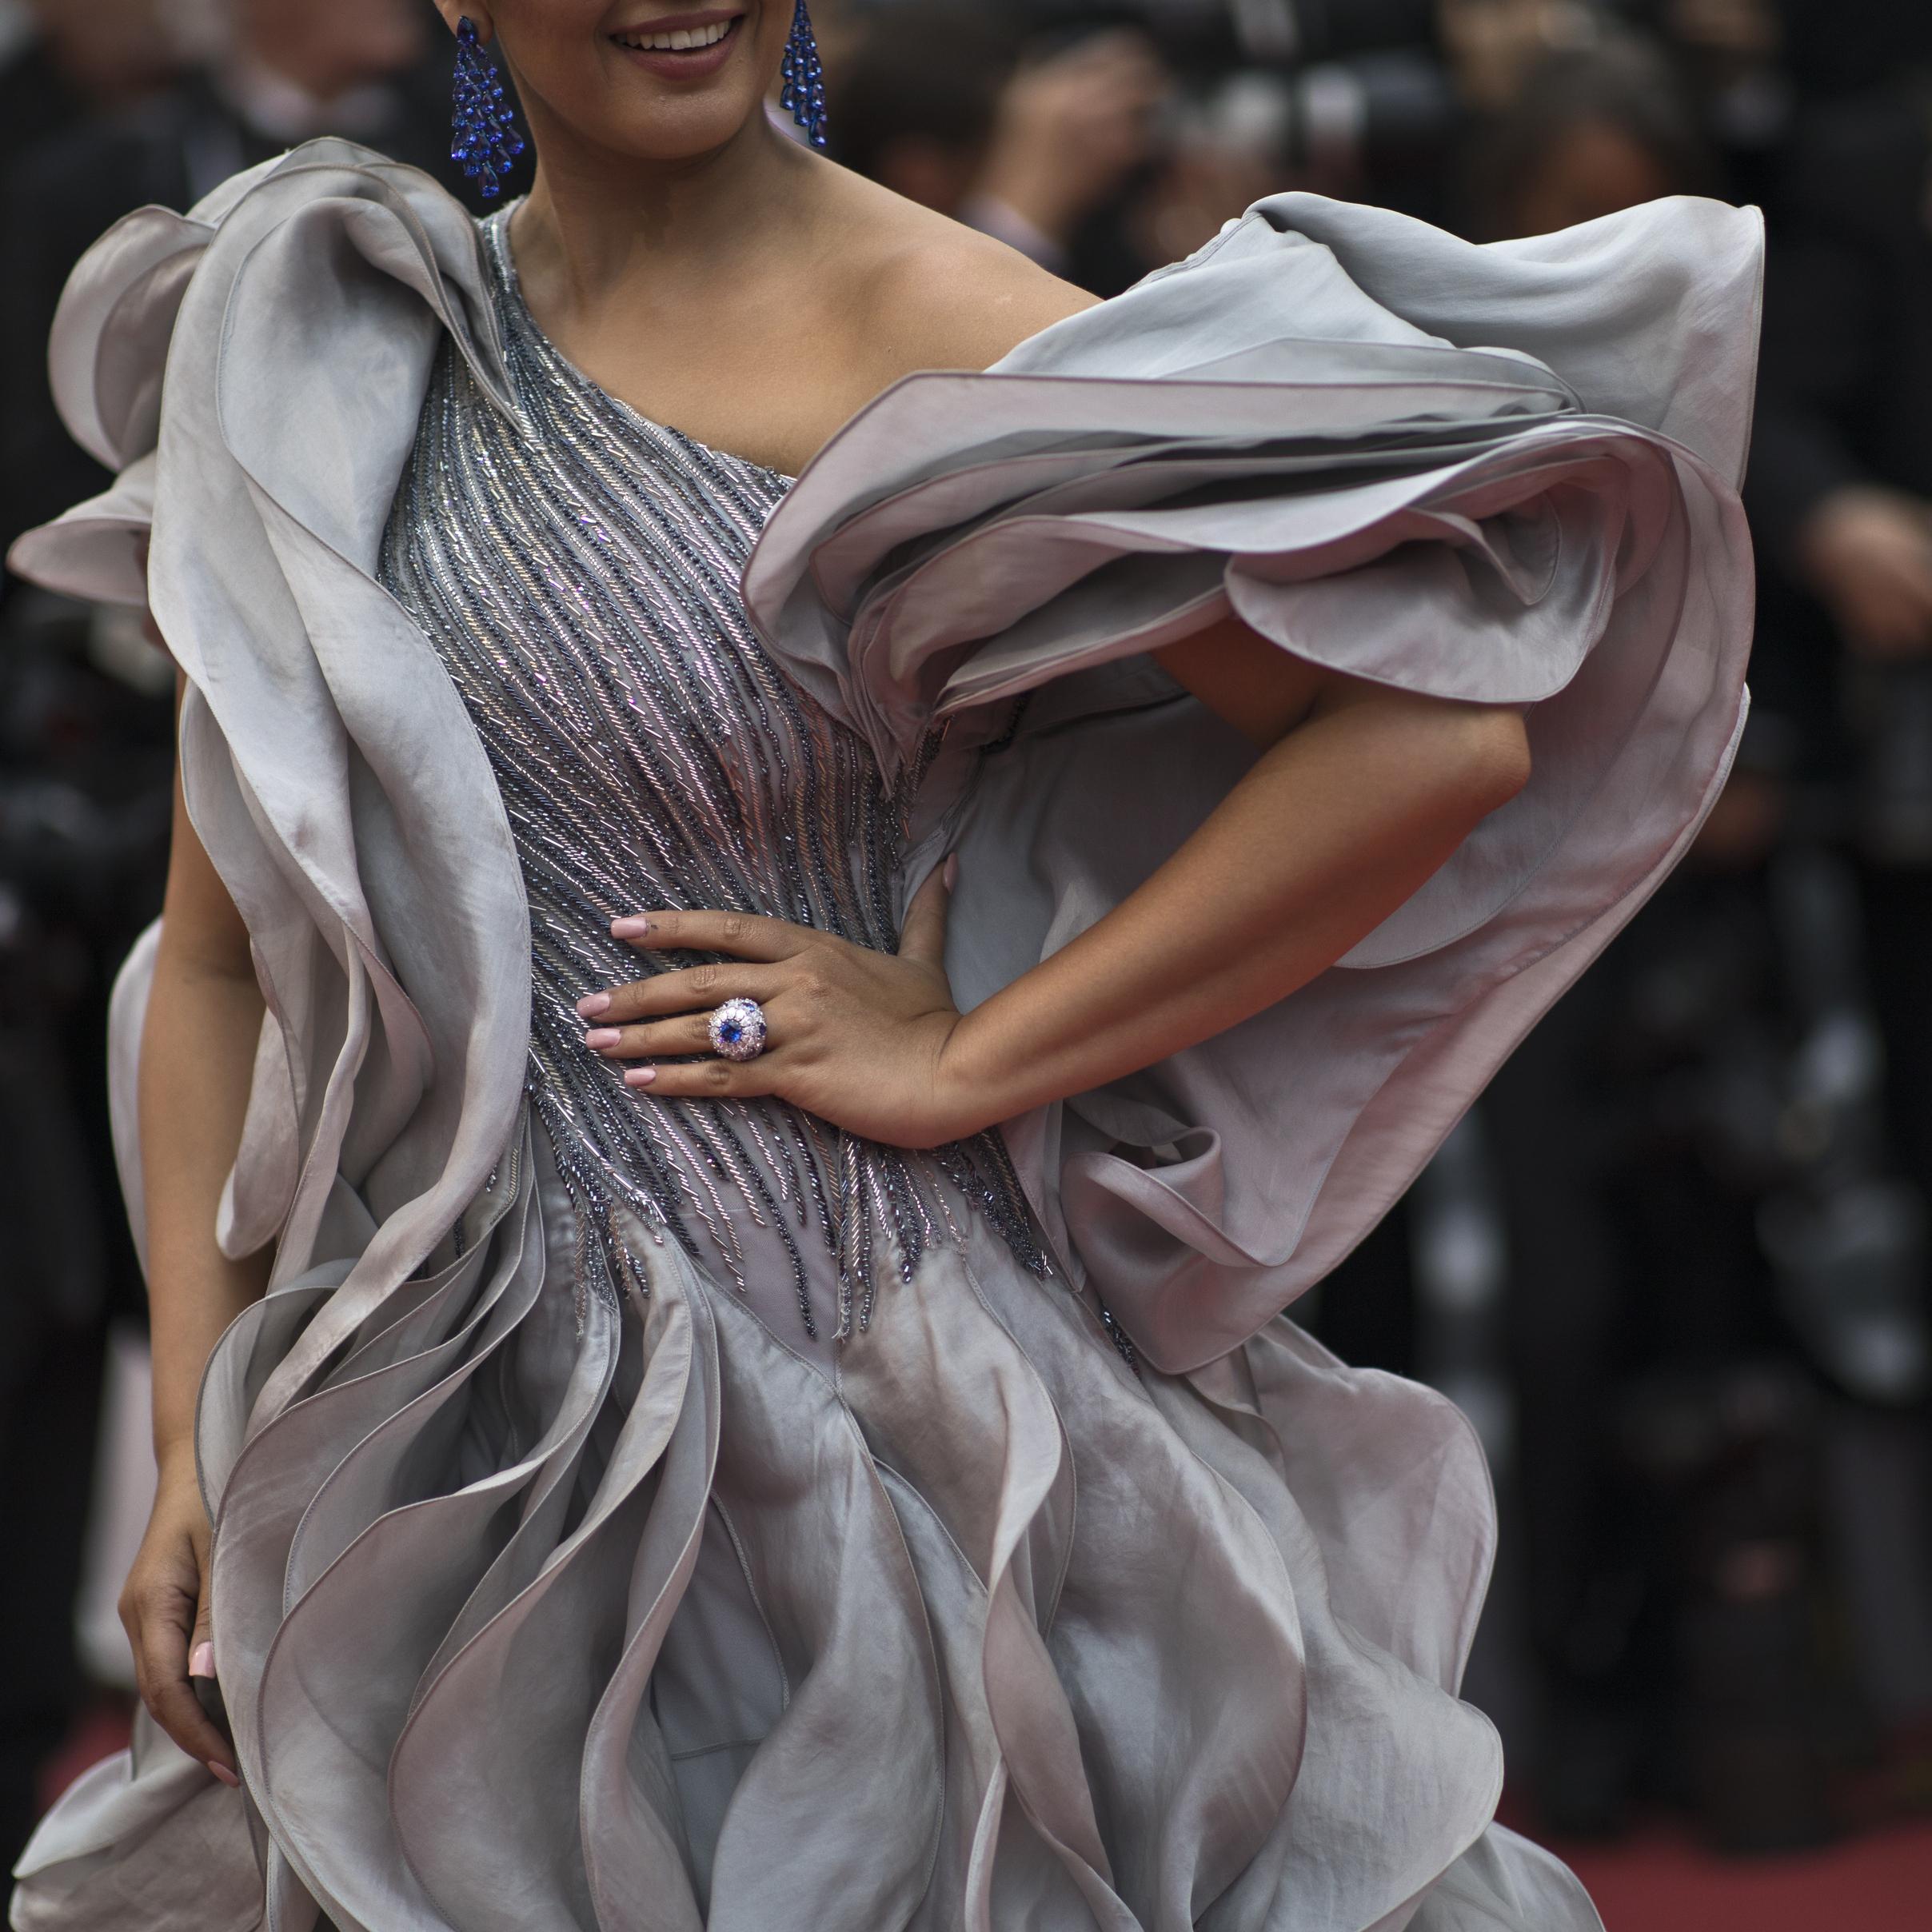 "La actriz Huma Qureshi lució un vestido de la firma de moda Gaurav Gupta Couture a su llegada al estreno de ""A Hidden Life"". (Foto: AP/Petros Giannakouris)"